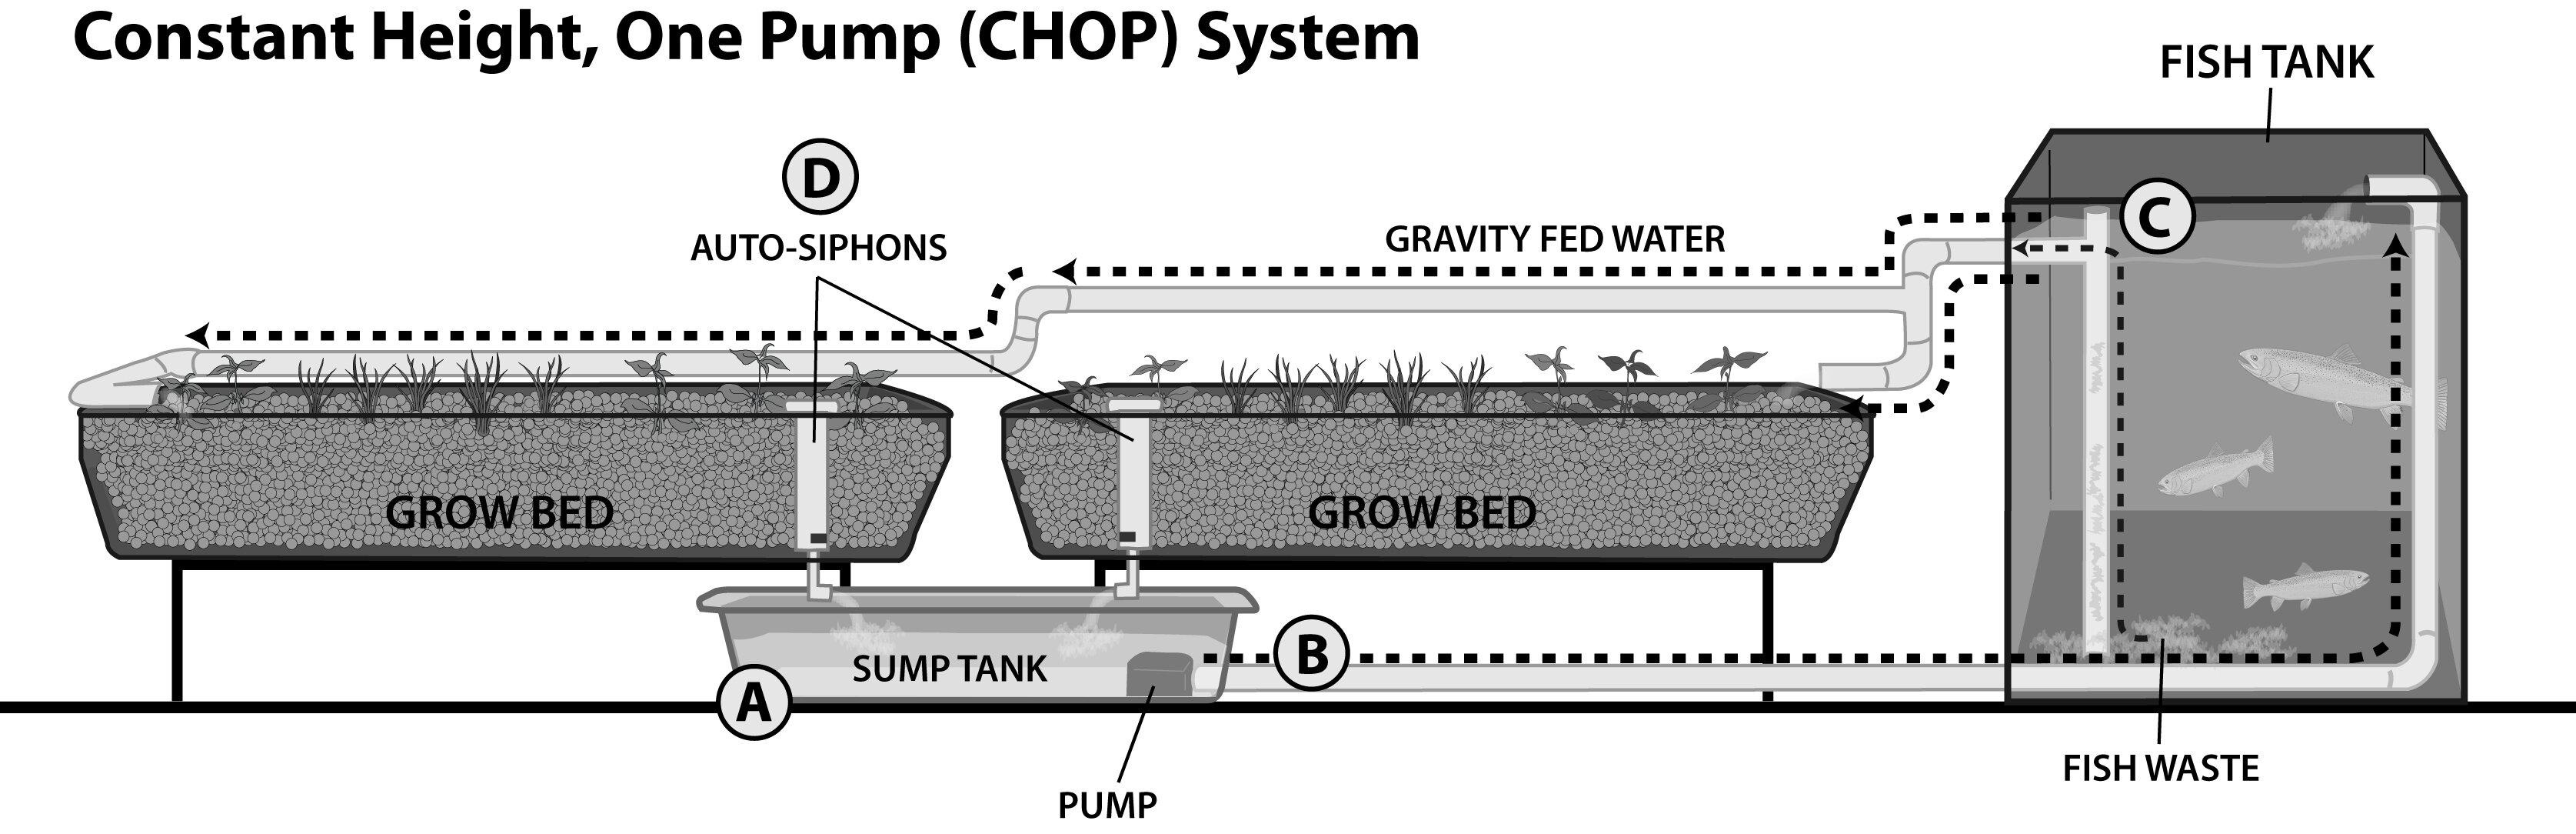 Chop aquaponics diagram chop free engine image for user for Hydroponic raft system design